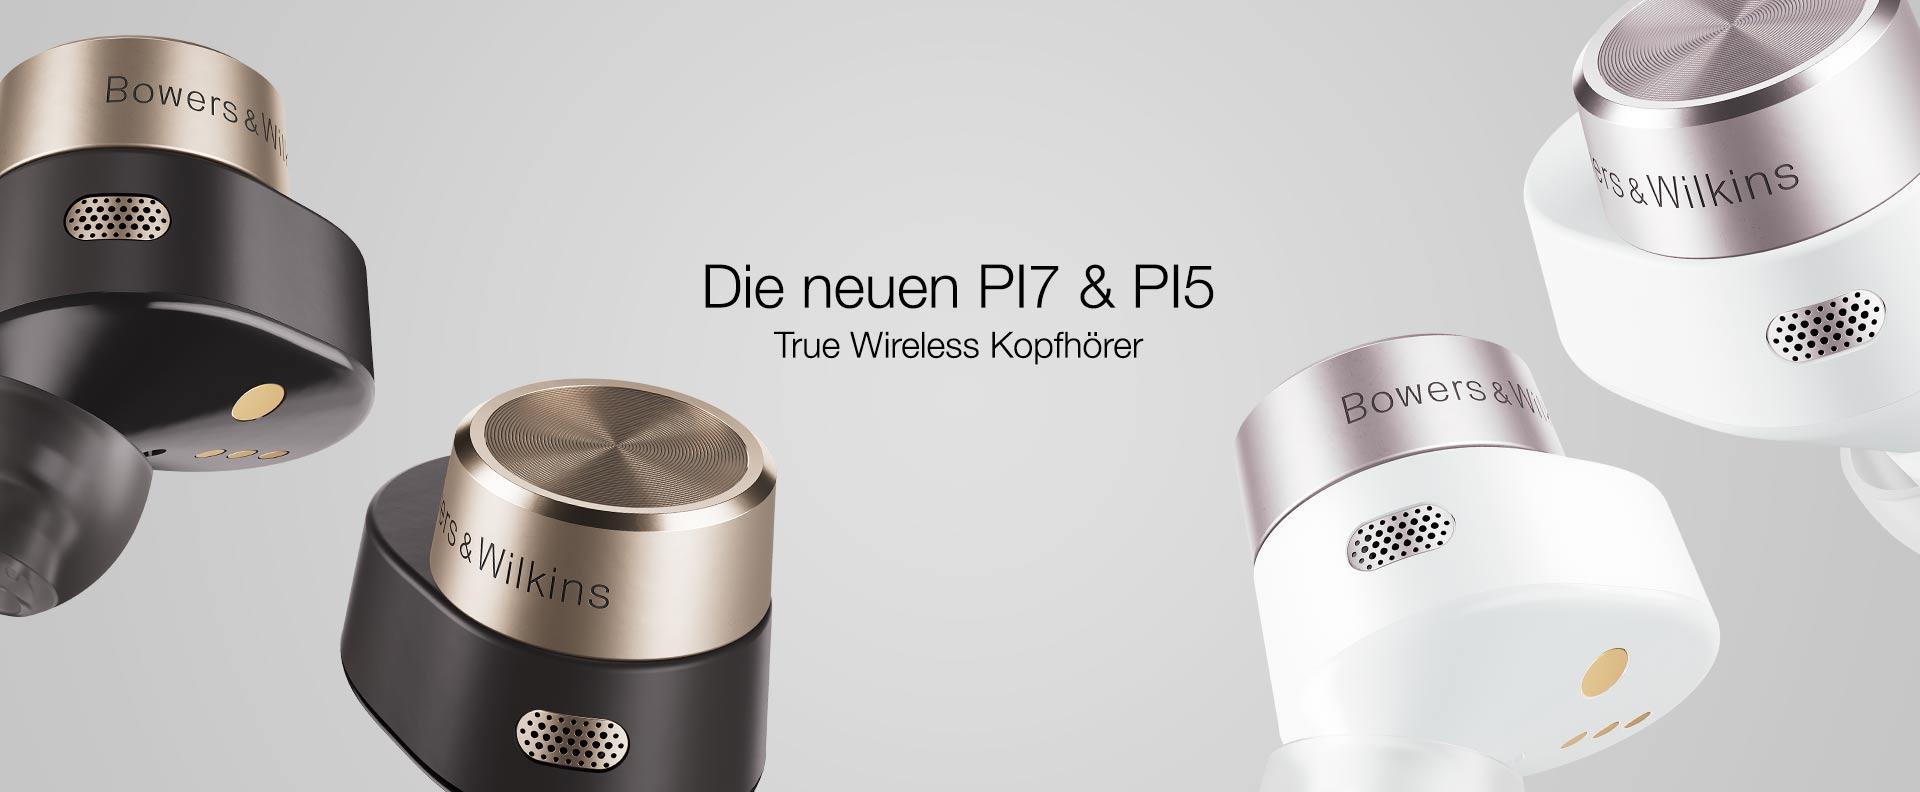 Bowers & Wilkins PI7 PI5